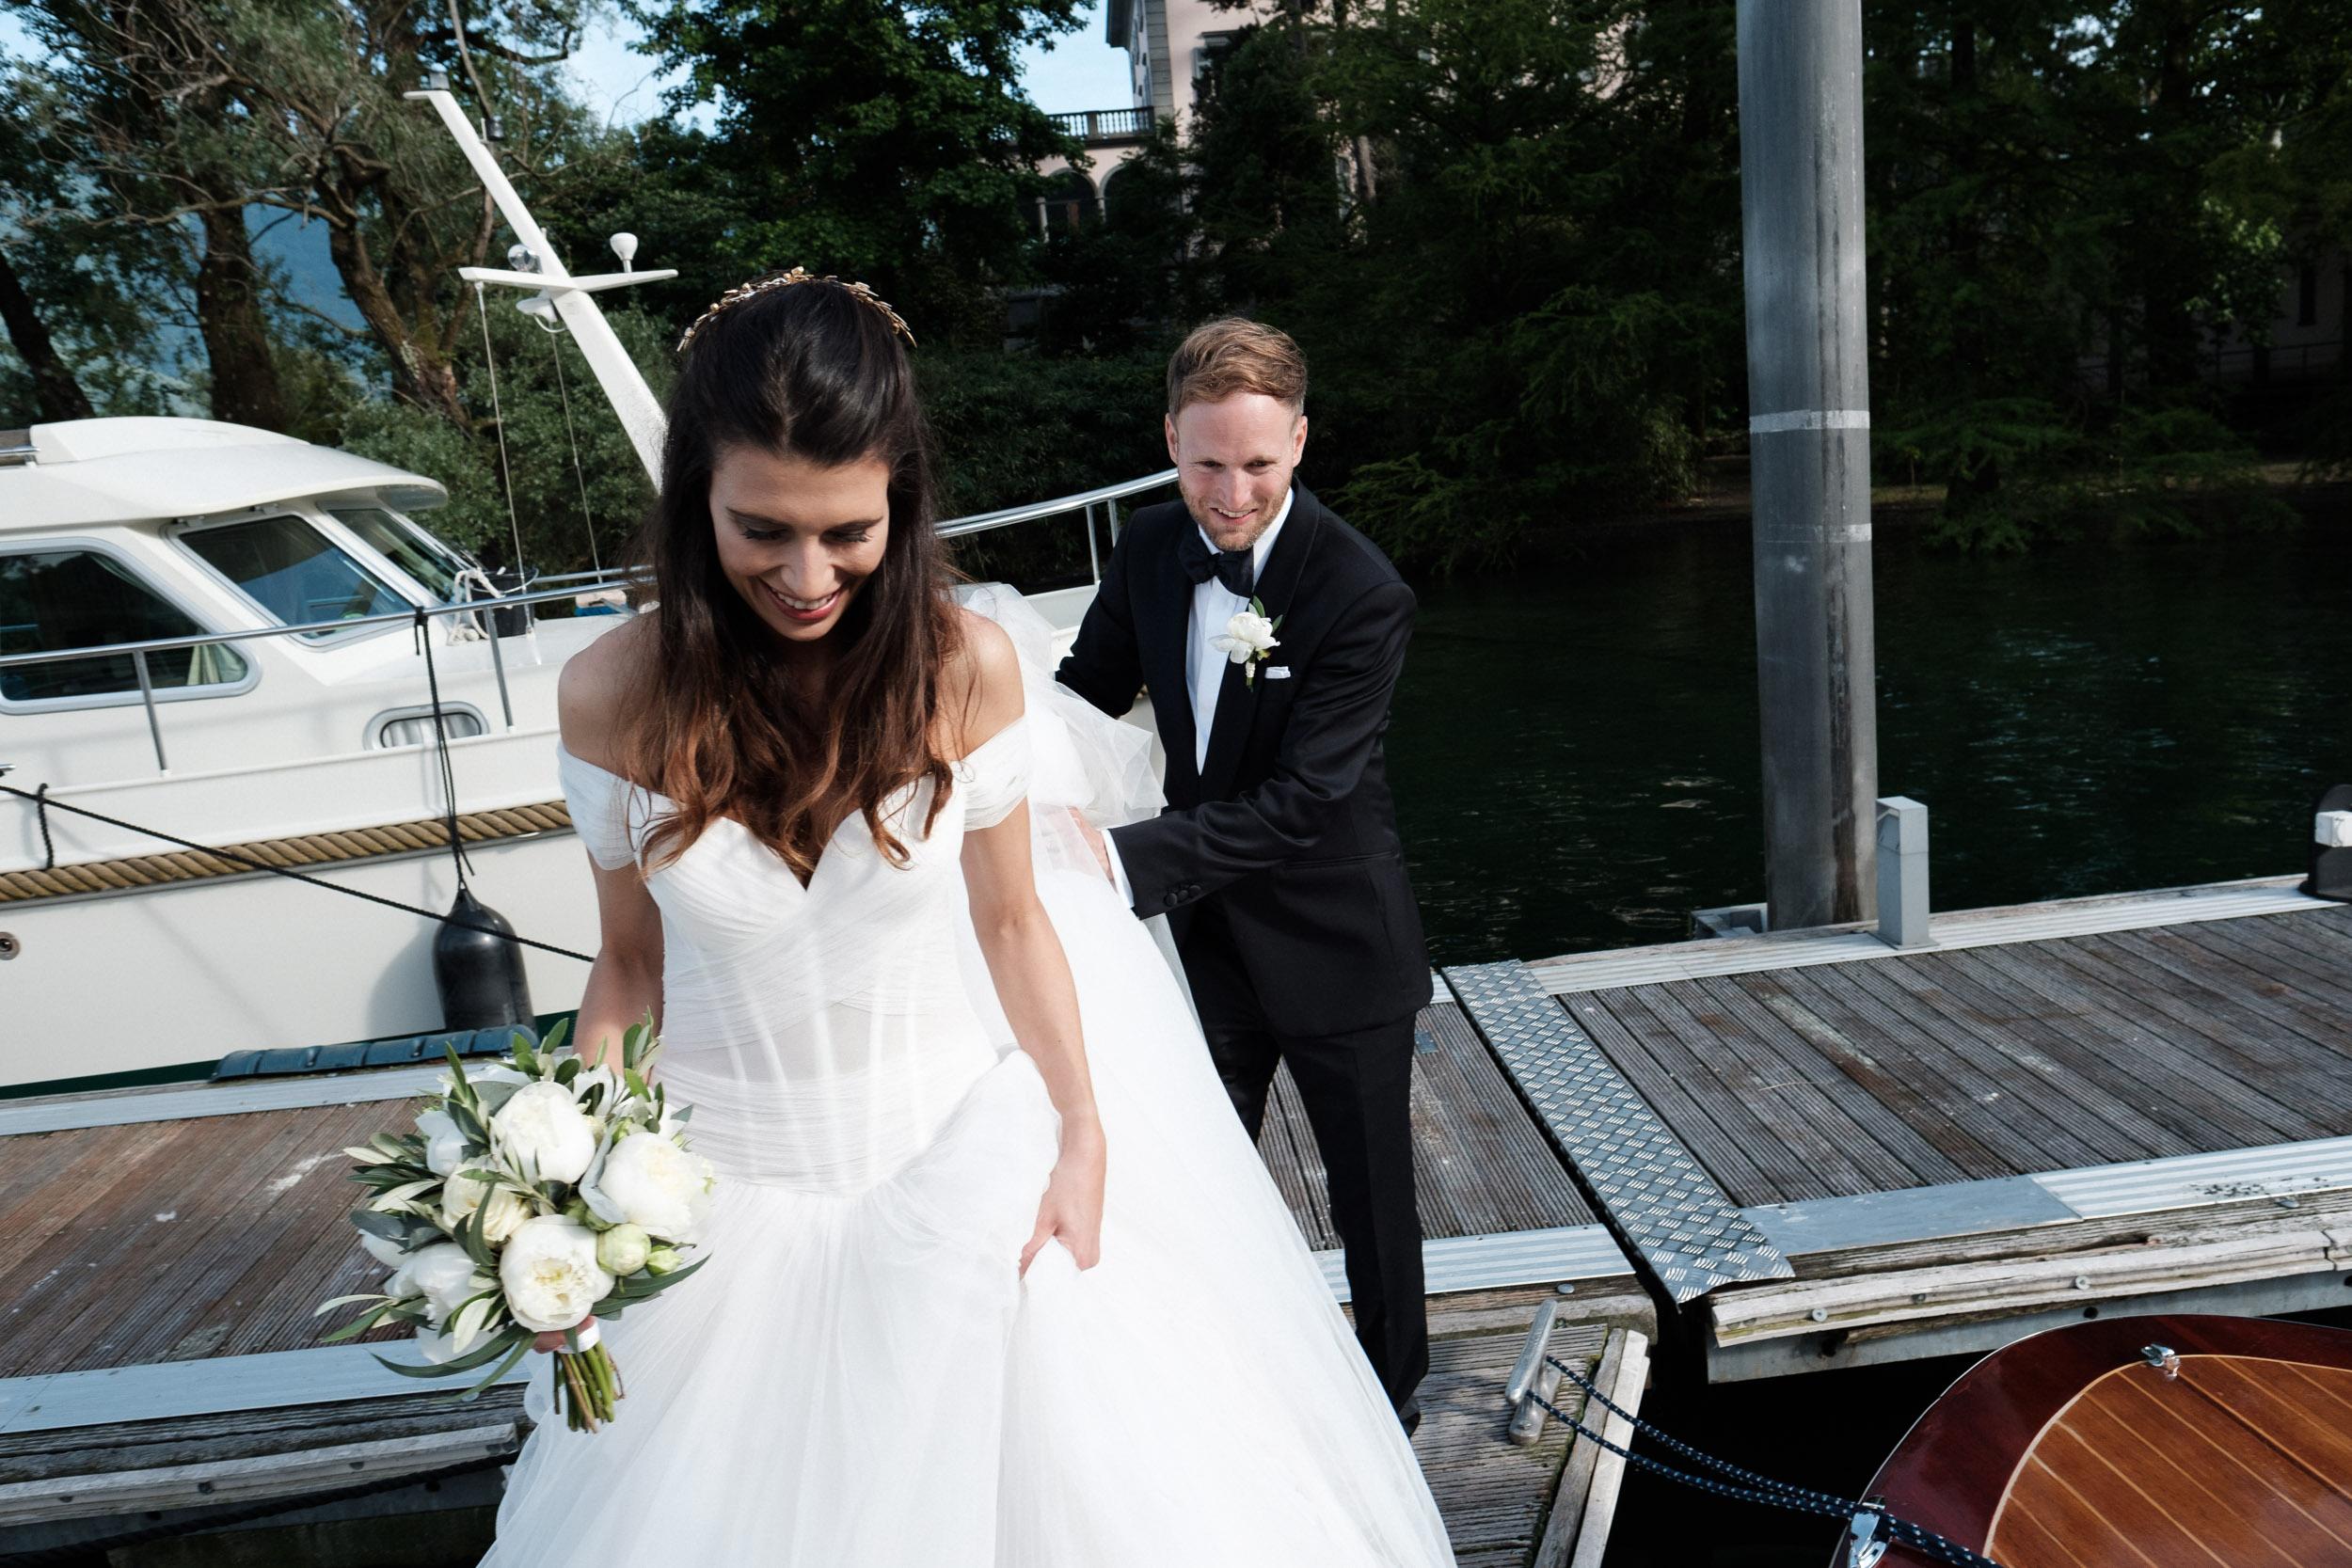 olivia-andreas-wedding-switzerland-414.jpg